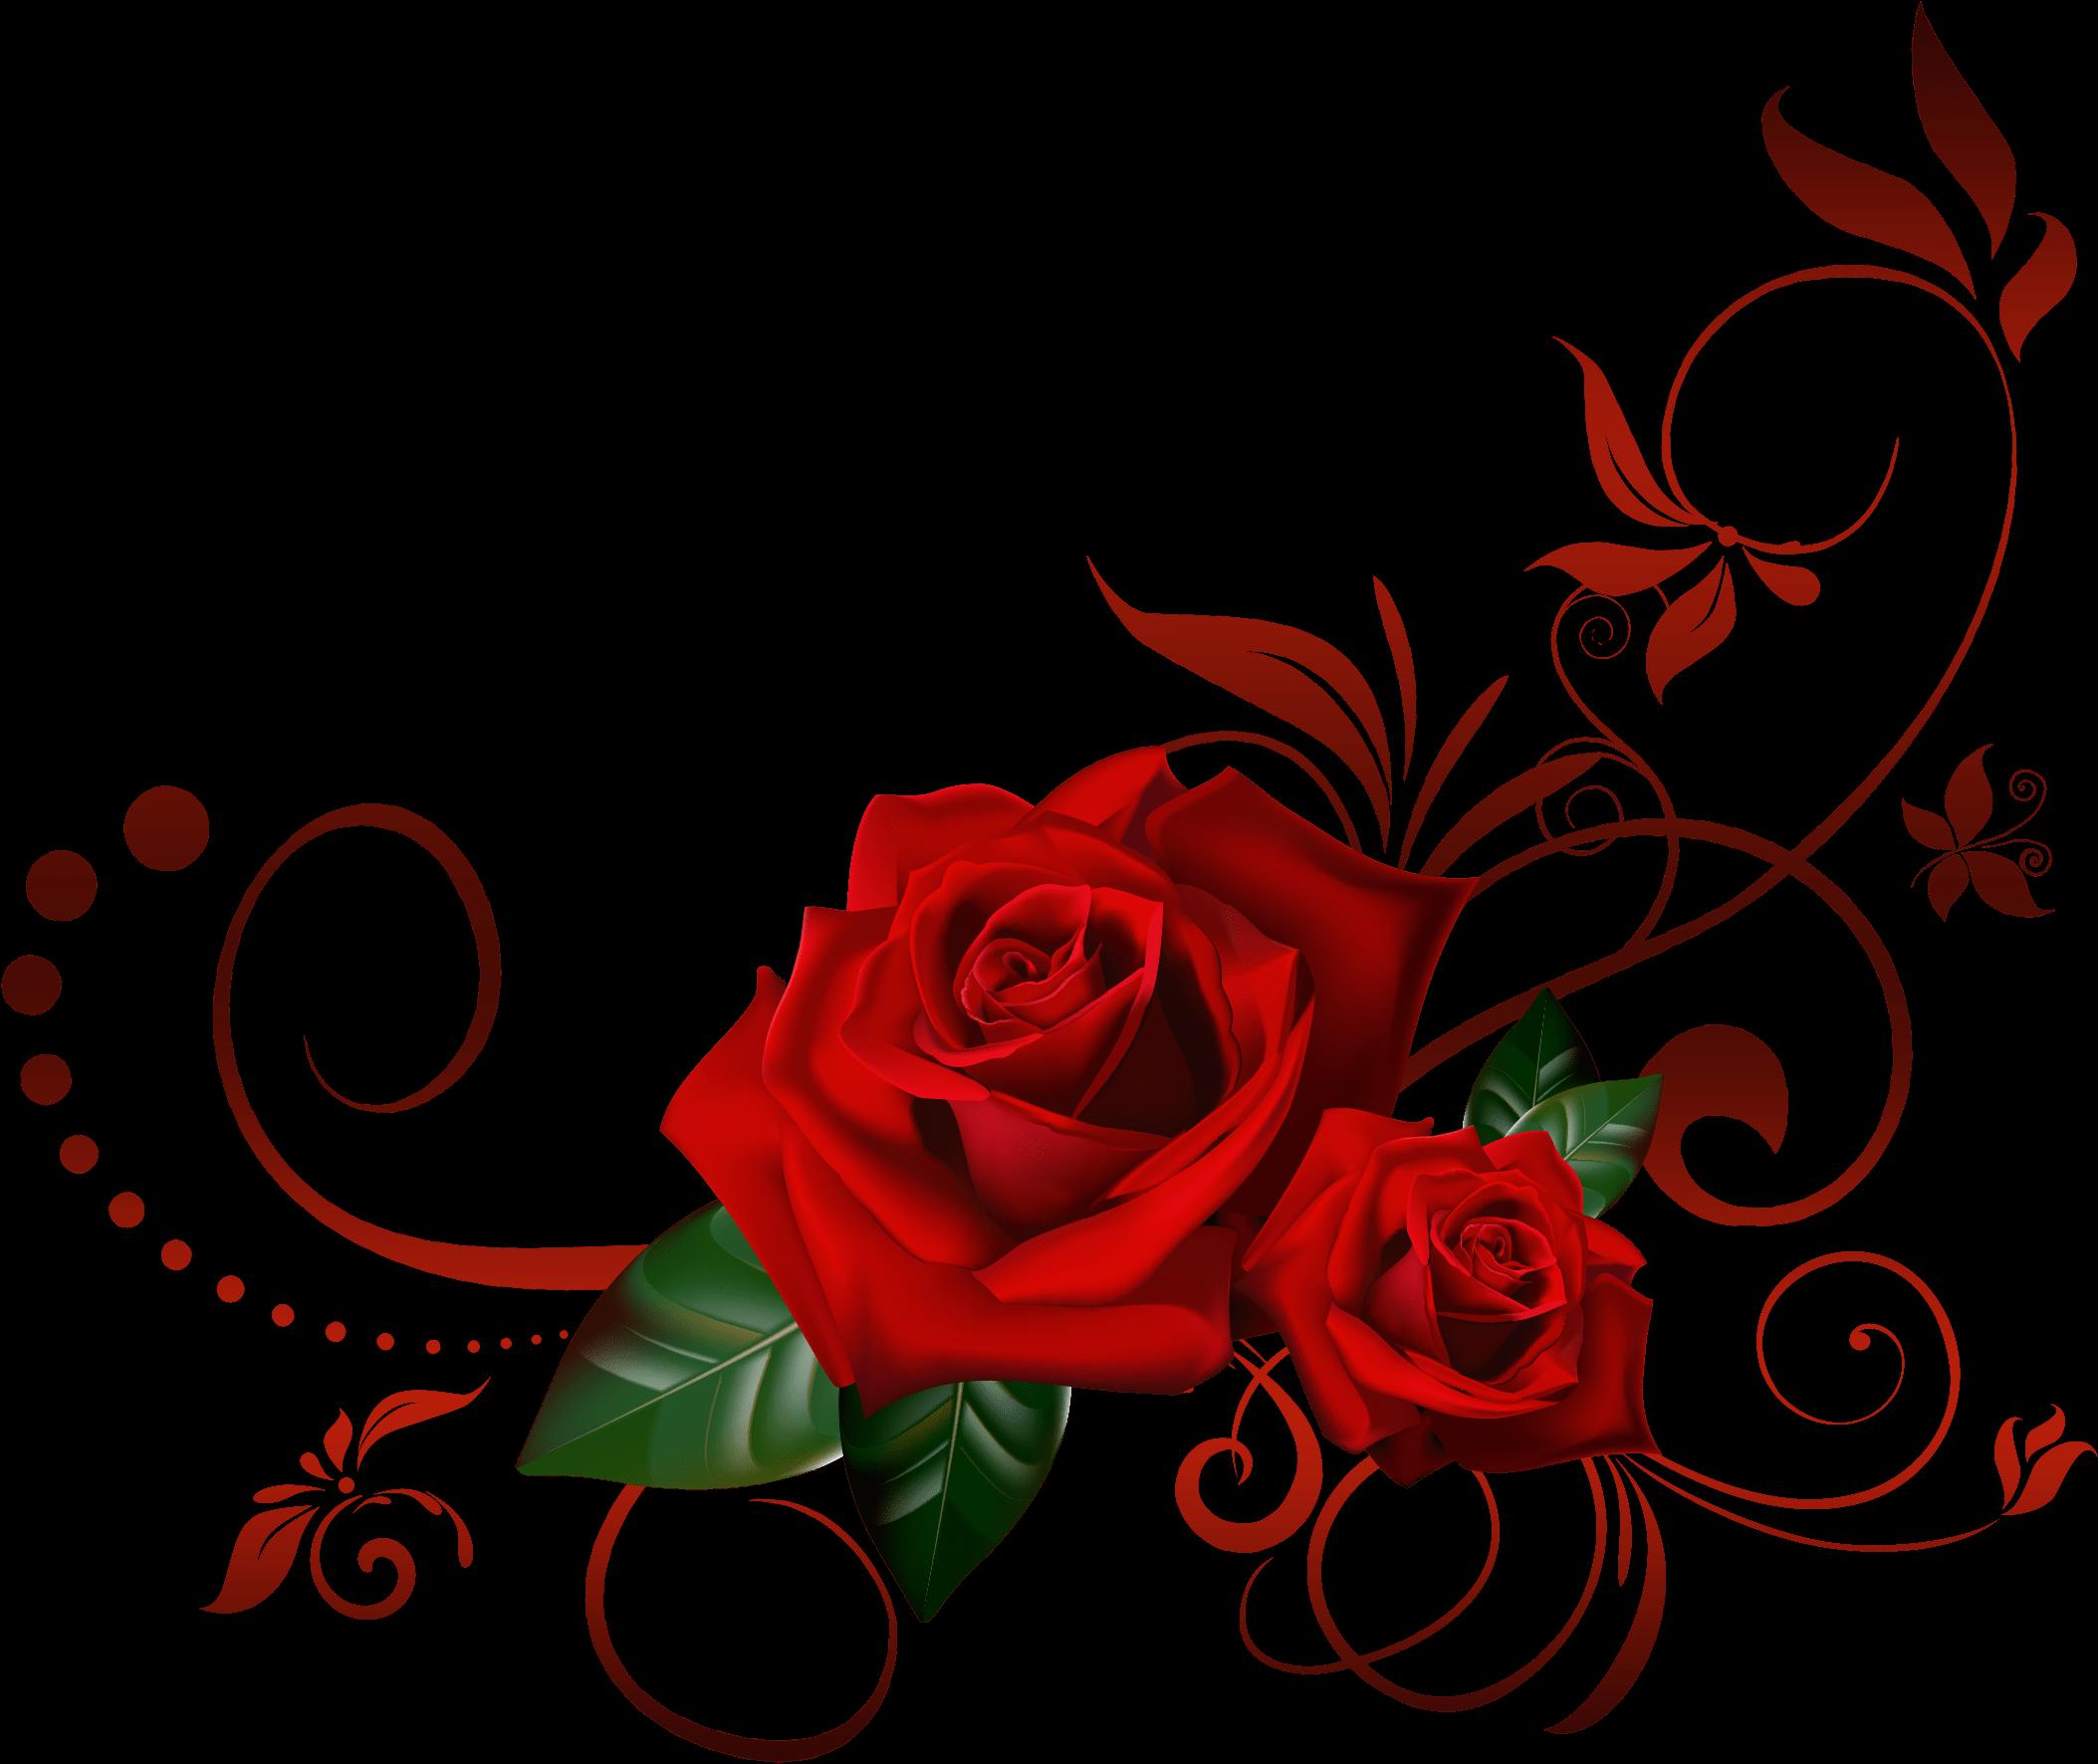 The Rose & Crown - Black Rose Border Png - Free ... - Black Glitter Roses